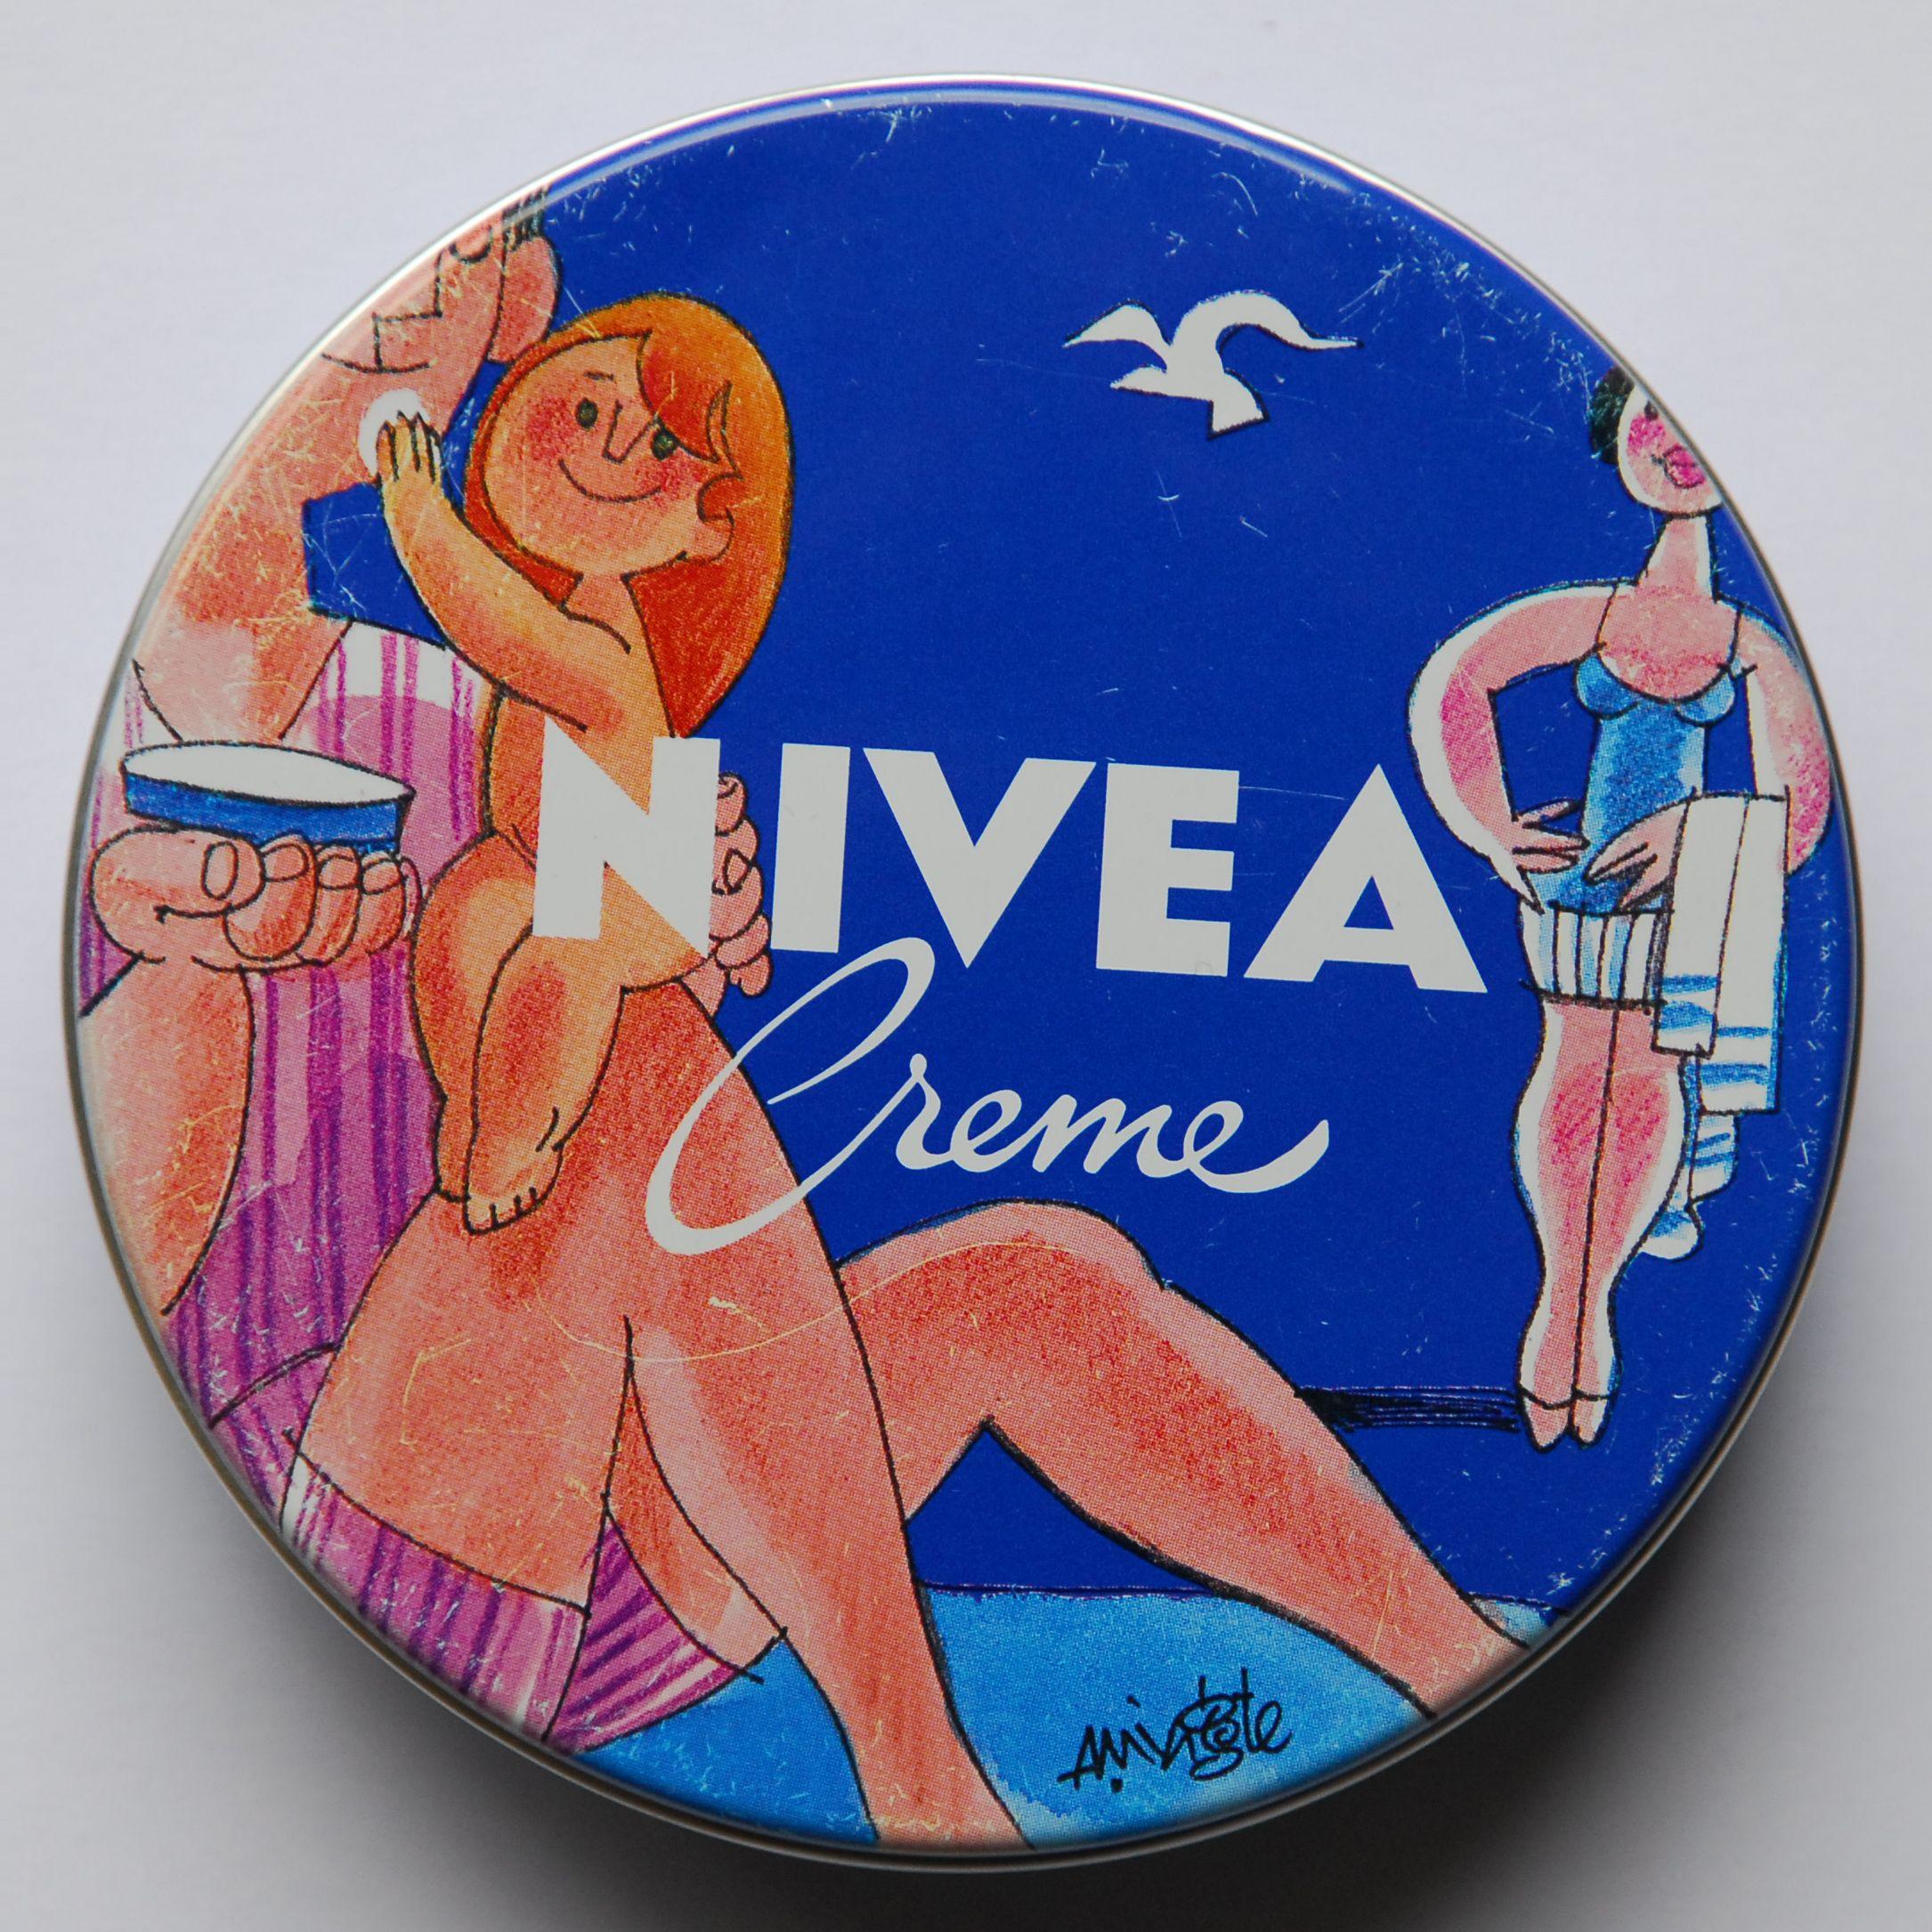 Nivea Designer Dose / 150ml /Spanien